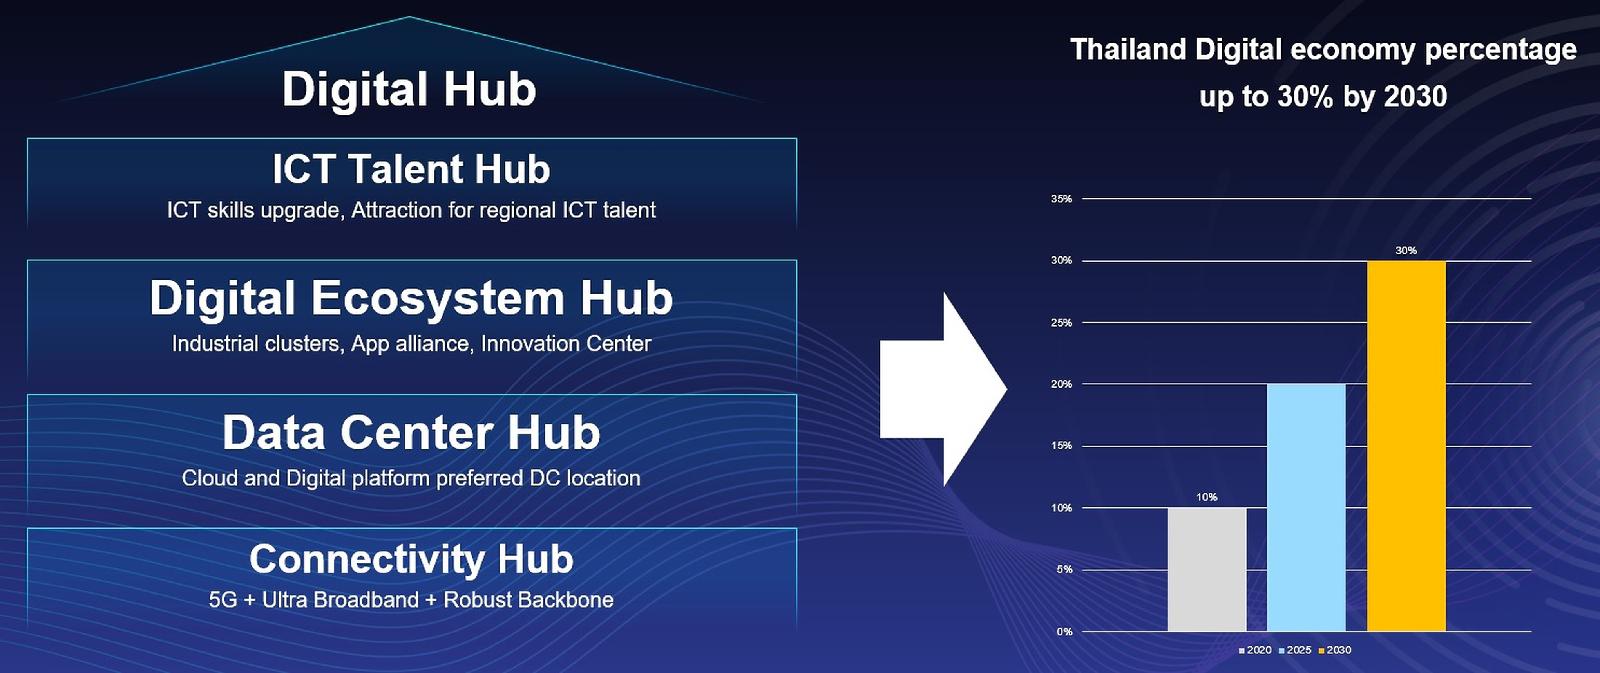 Huawei เสริมพลังดิจิทัลให้ประเทศไทย มุ่งสู่การเป็นศูนย์กลางอาเซียน (ASEAN Digital Hub)